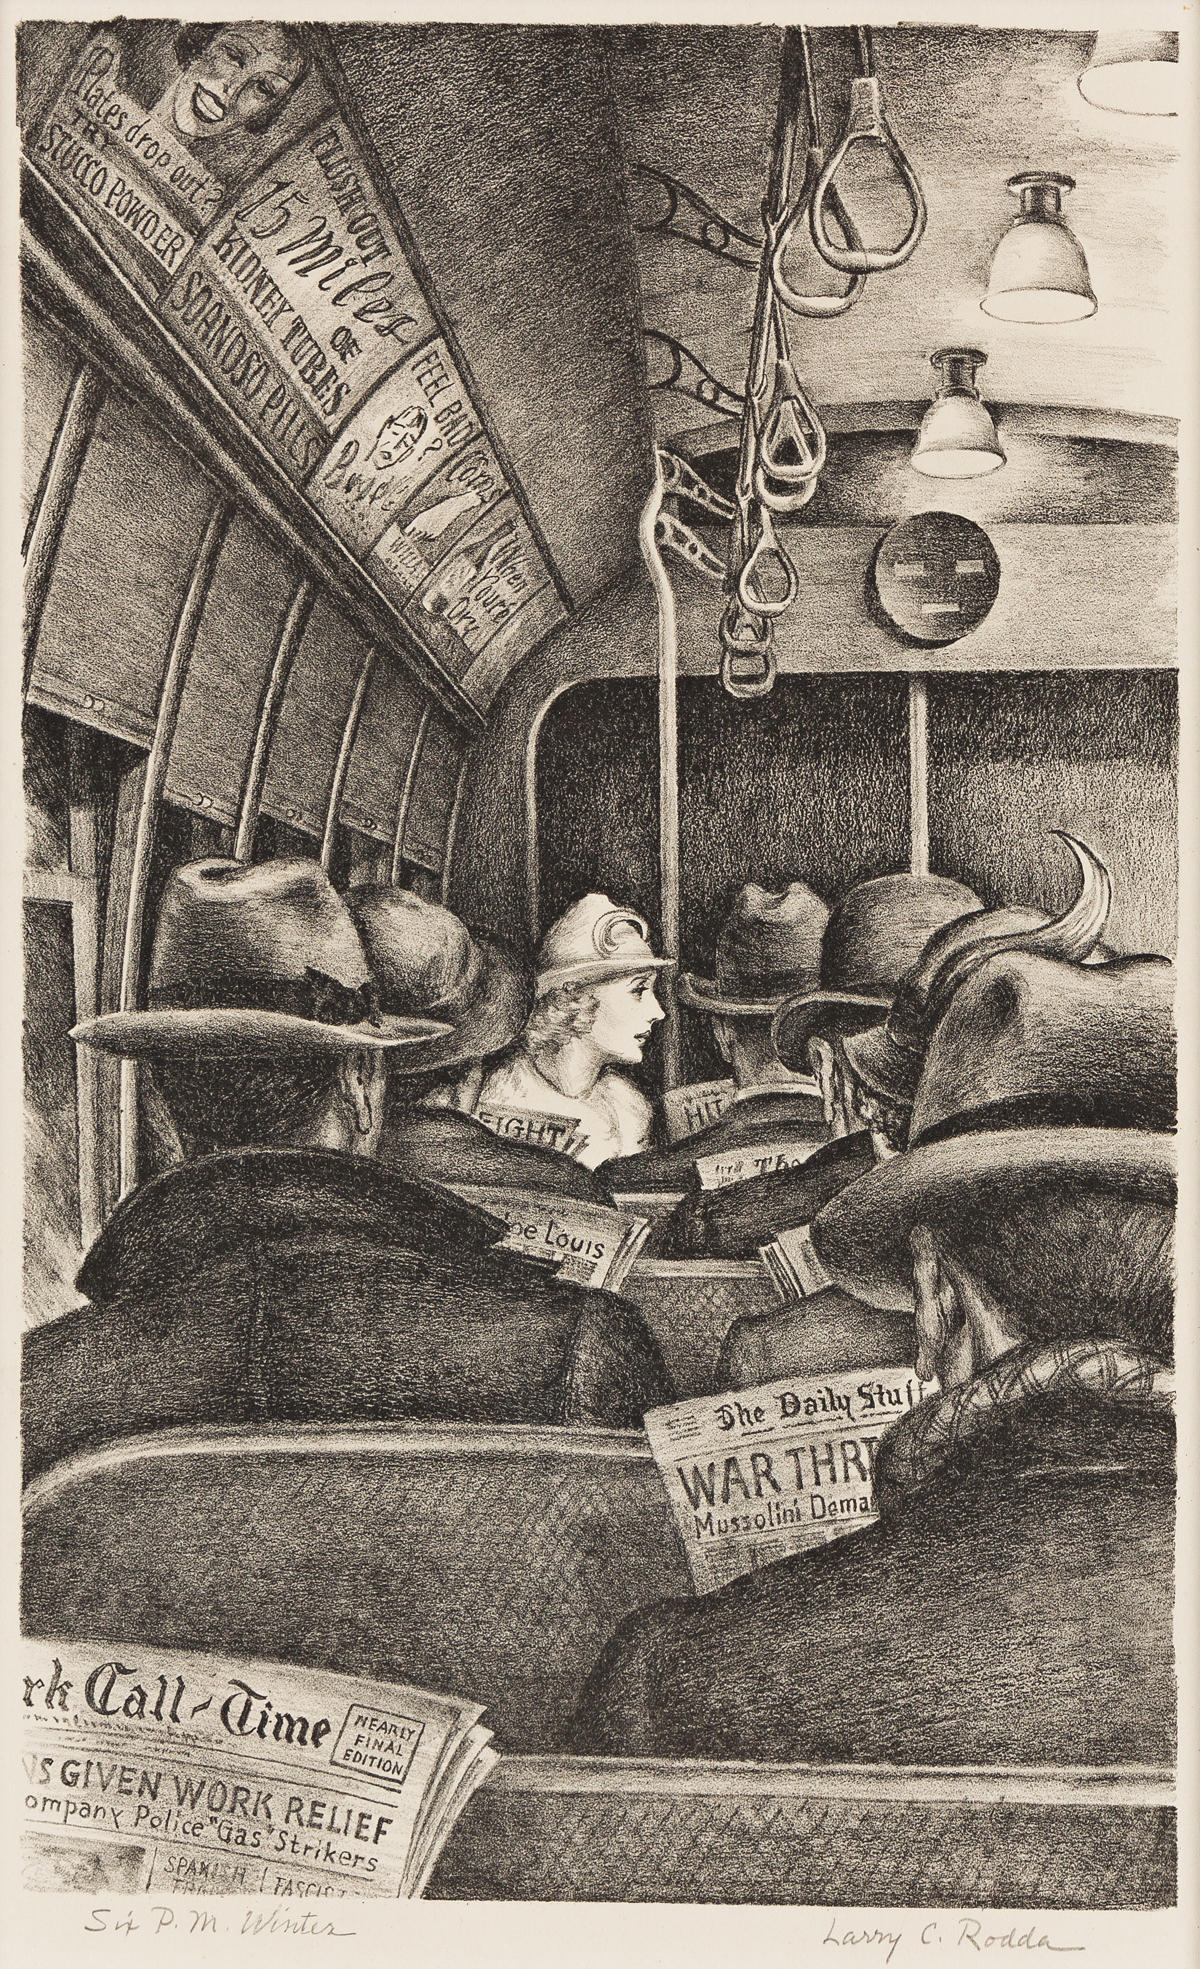 LARRY C. RODDA (1902-1989) Six P.M., Winter.